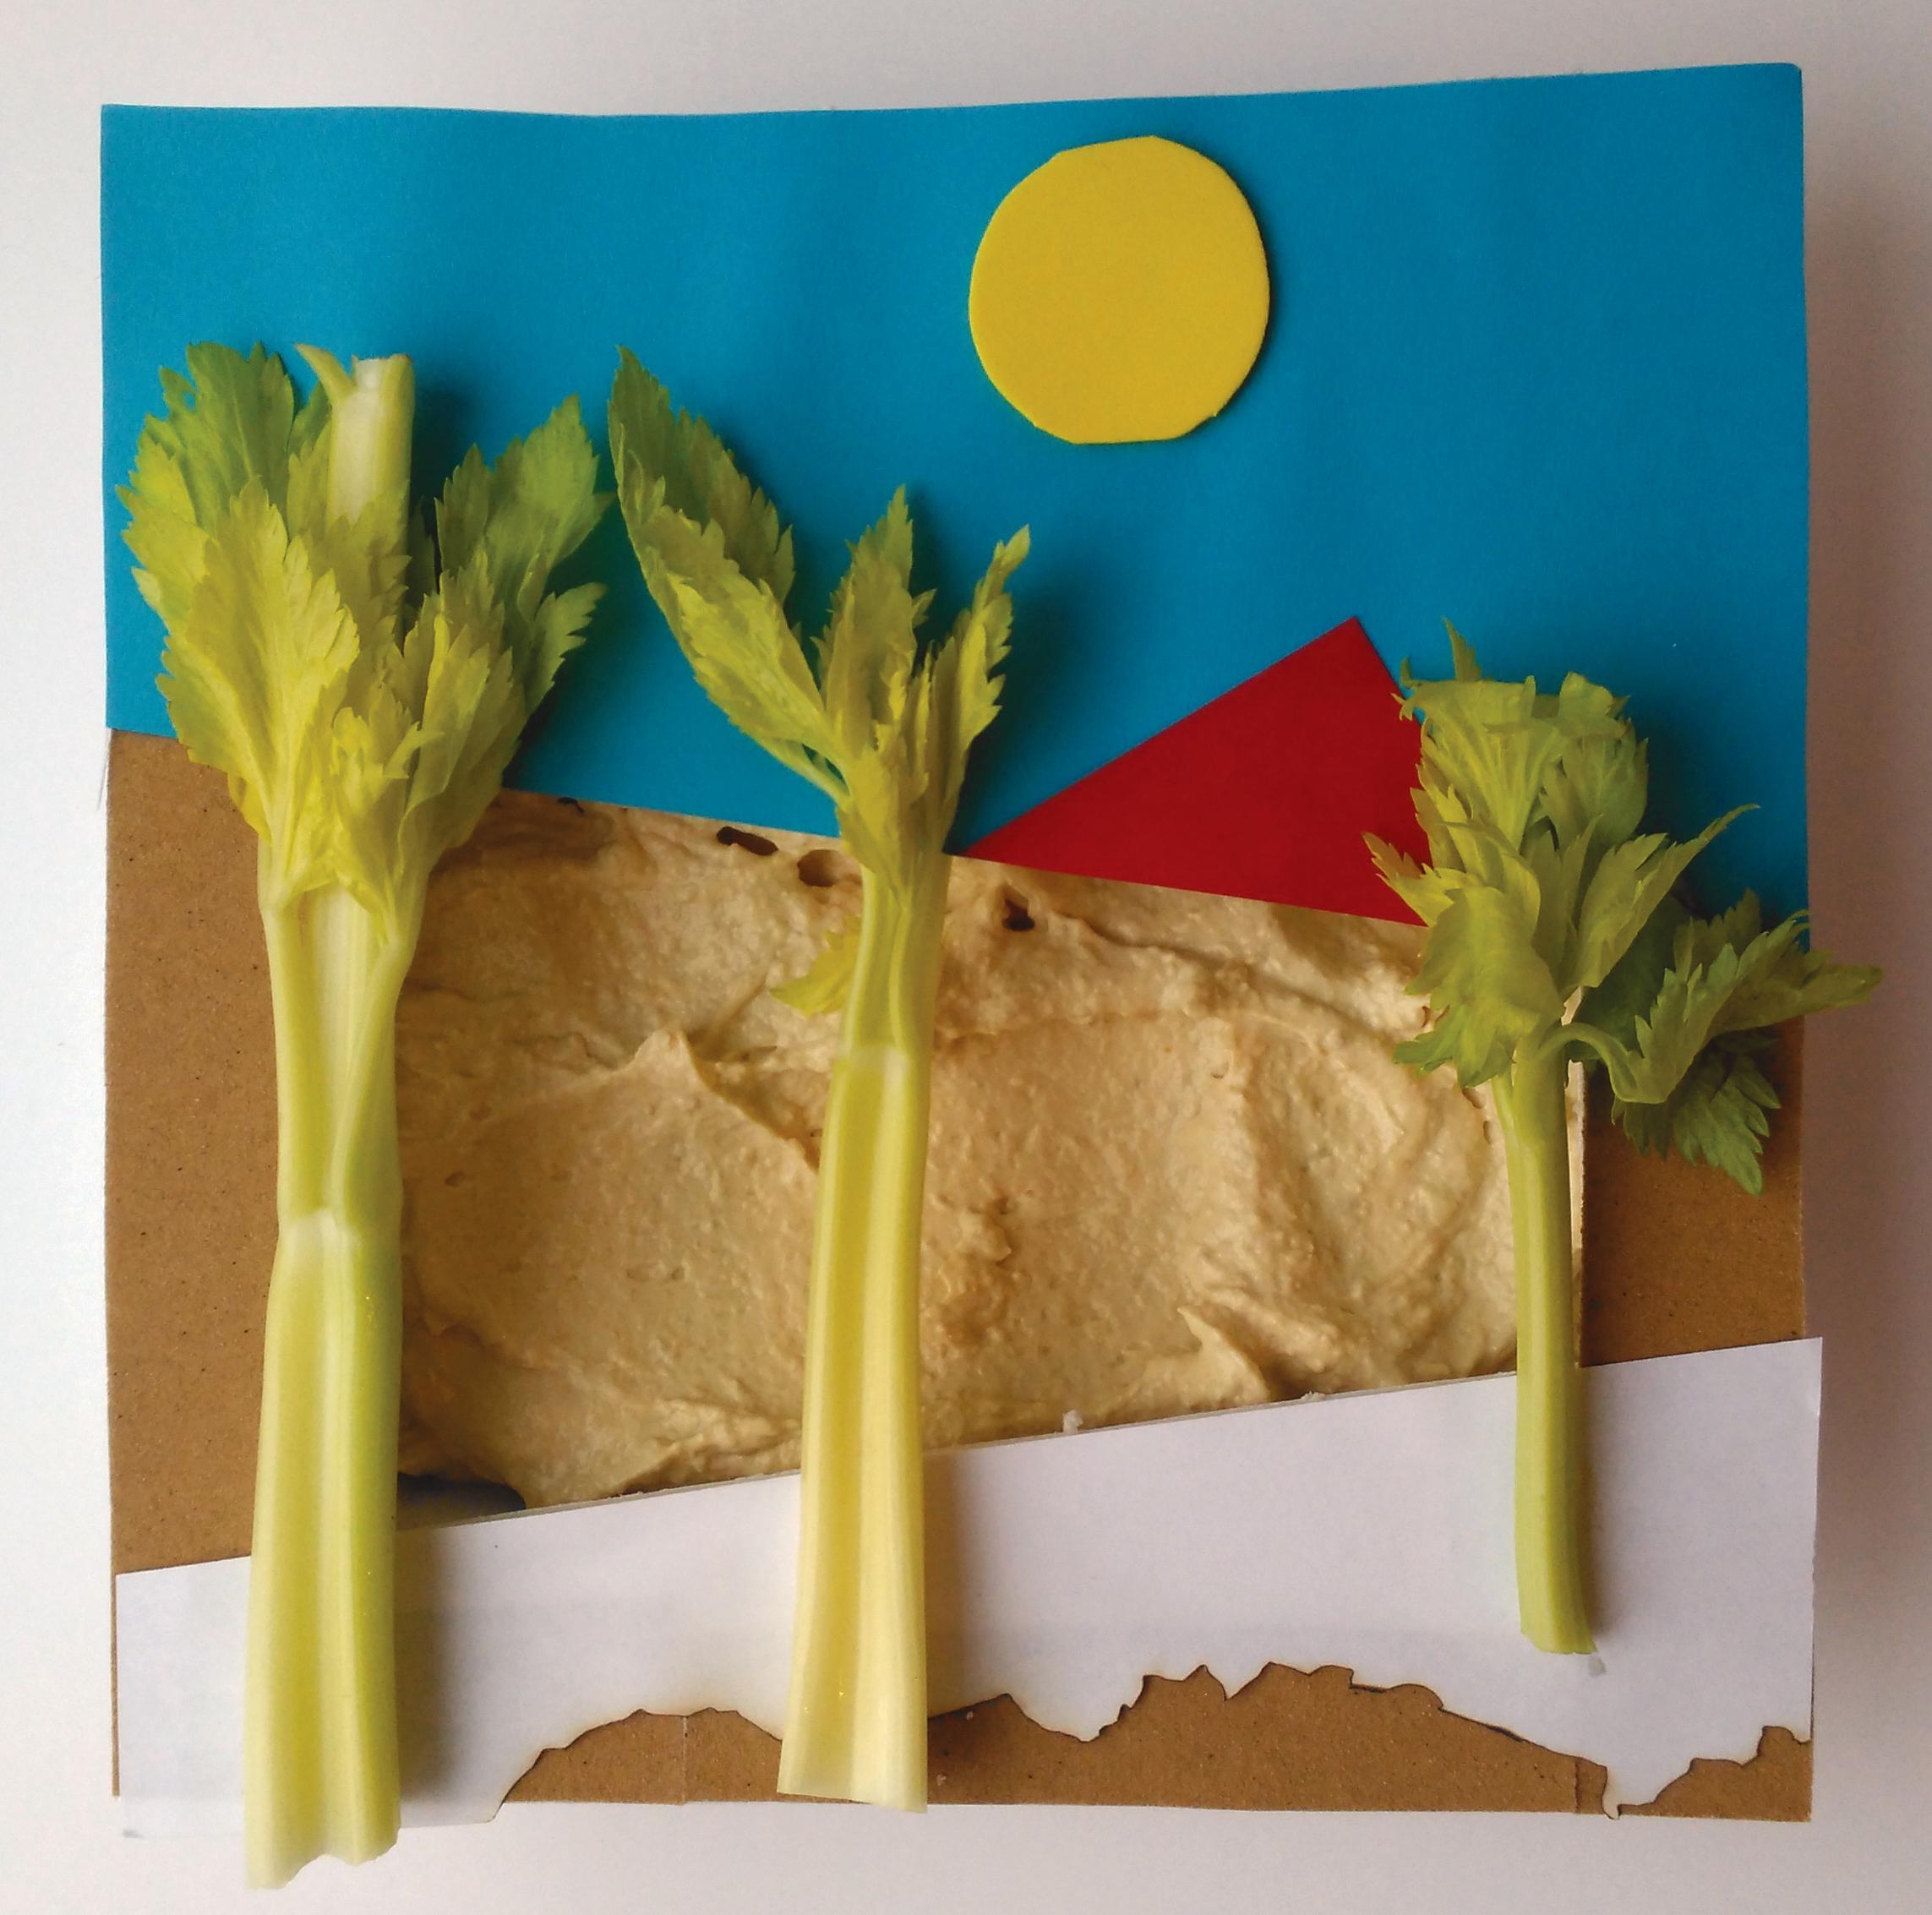 1. Houmous and Celery